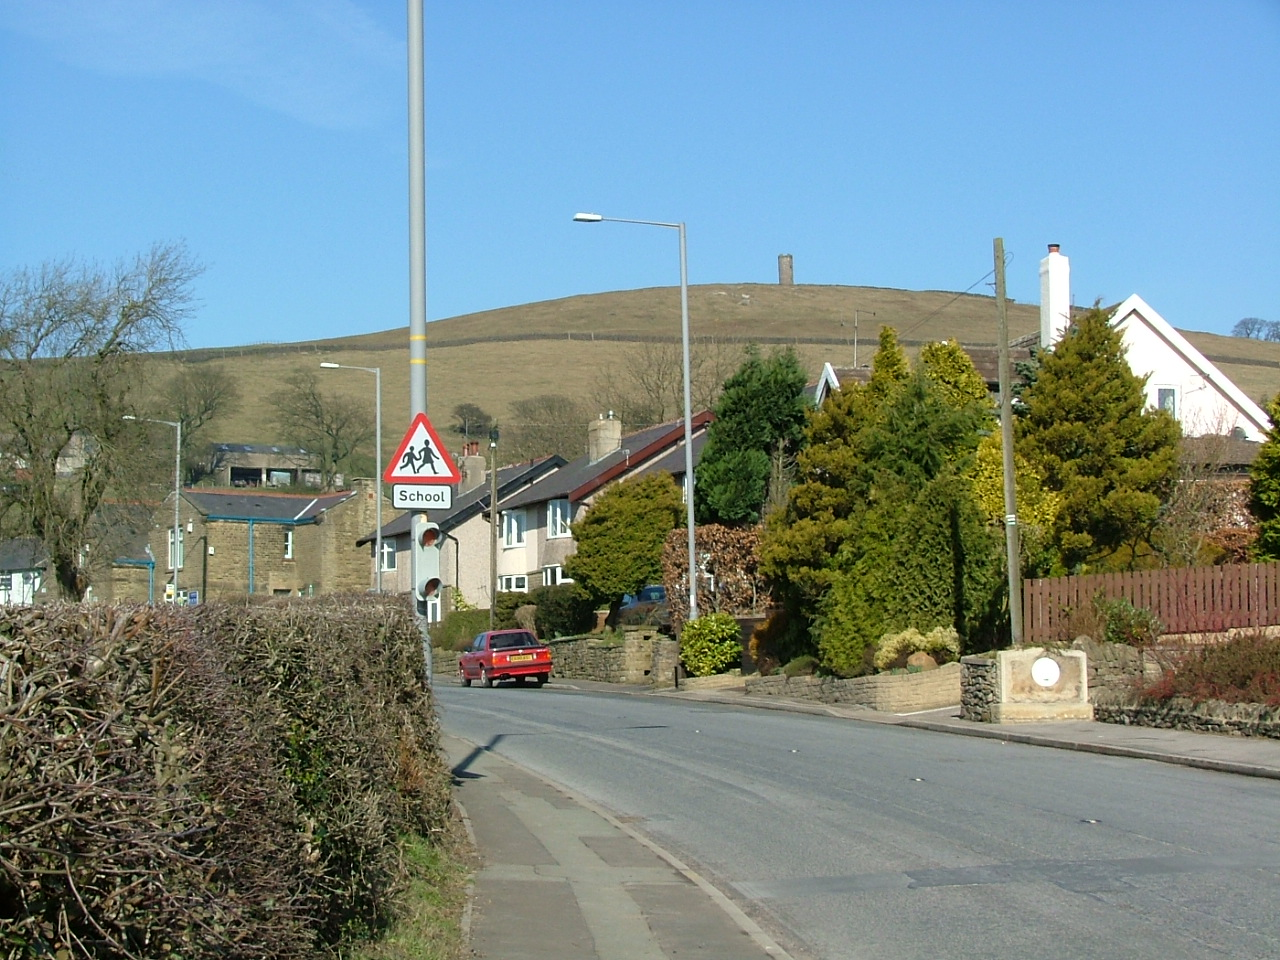 Location & Map, Gisburn Road, Blacko, Lancashire, BB9 6LS, England